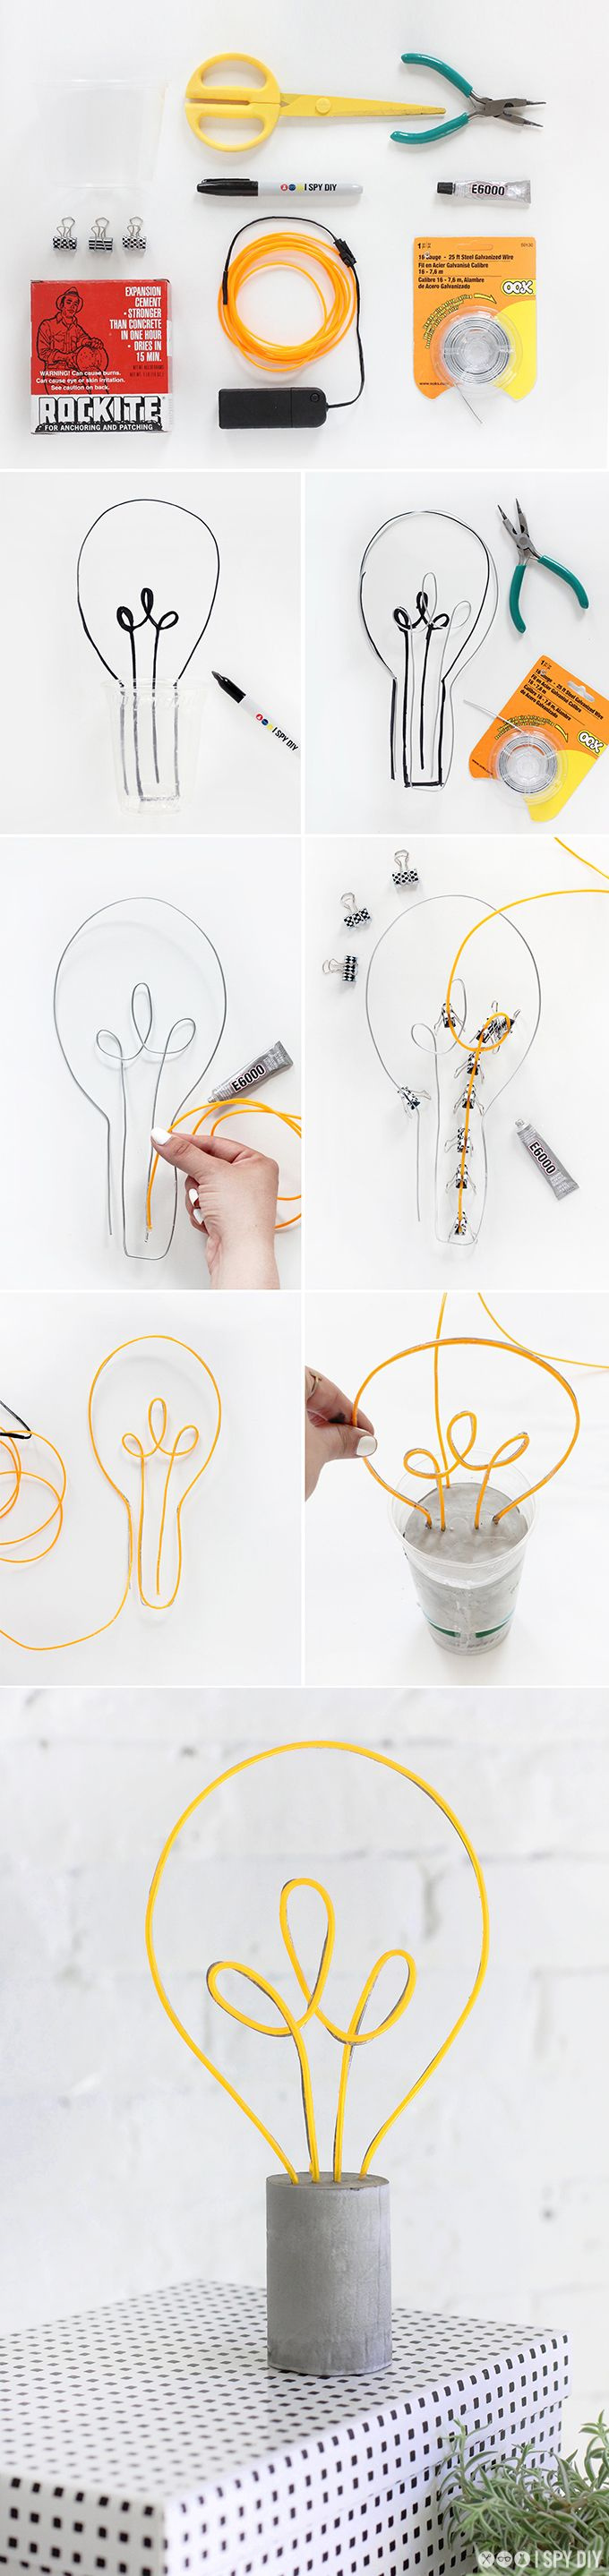 MY DIY | Neon Lightbulb Lamp | I SPY DIY